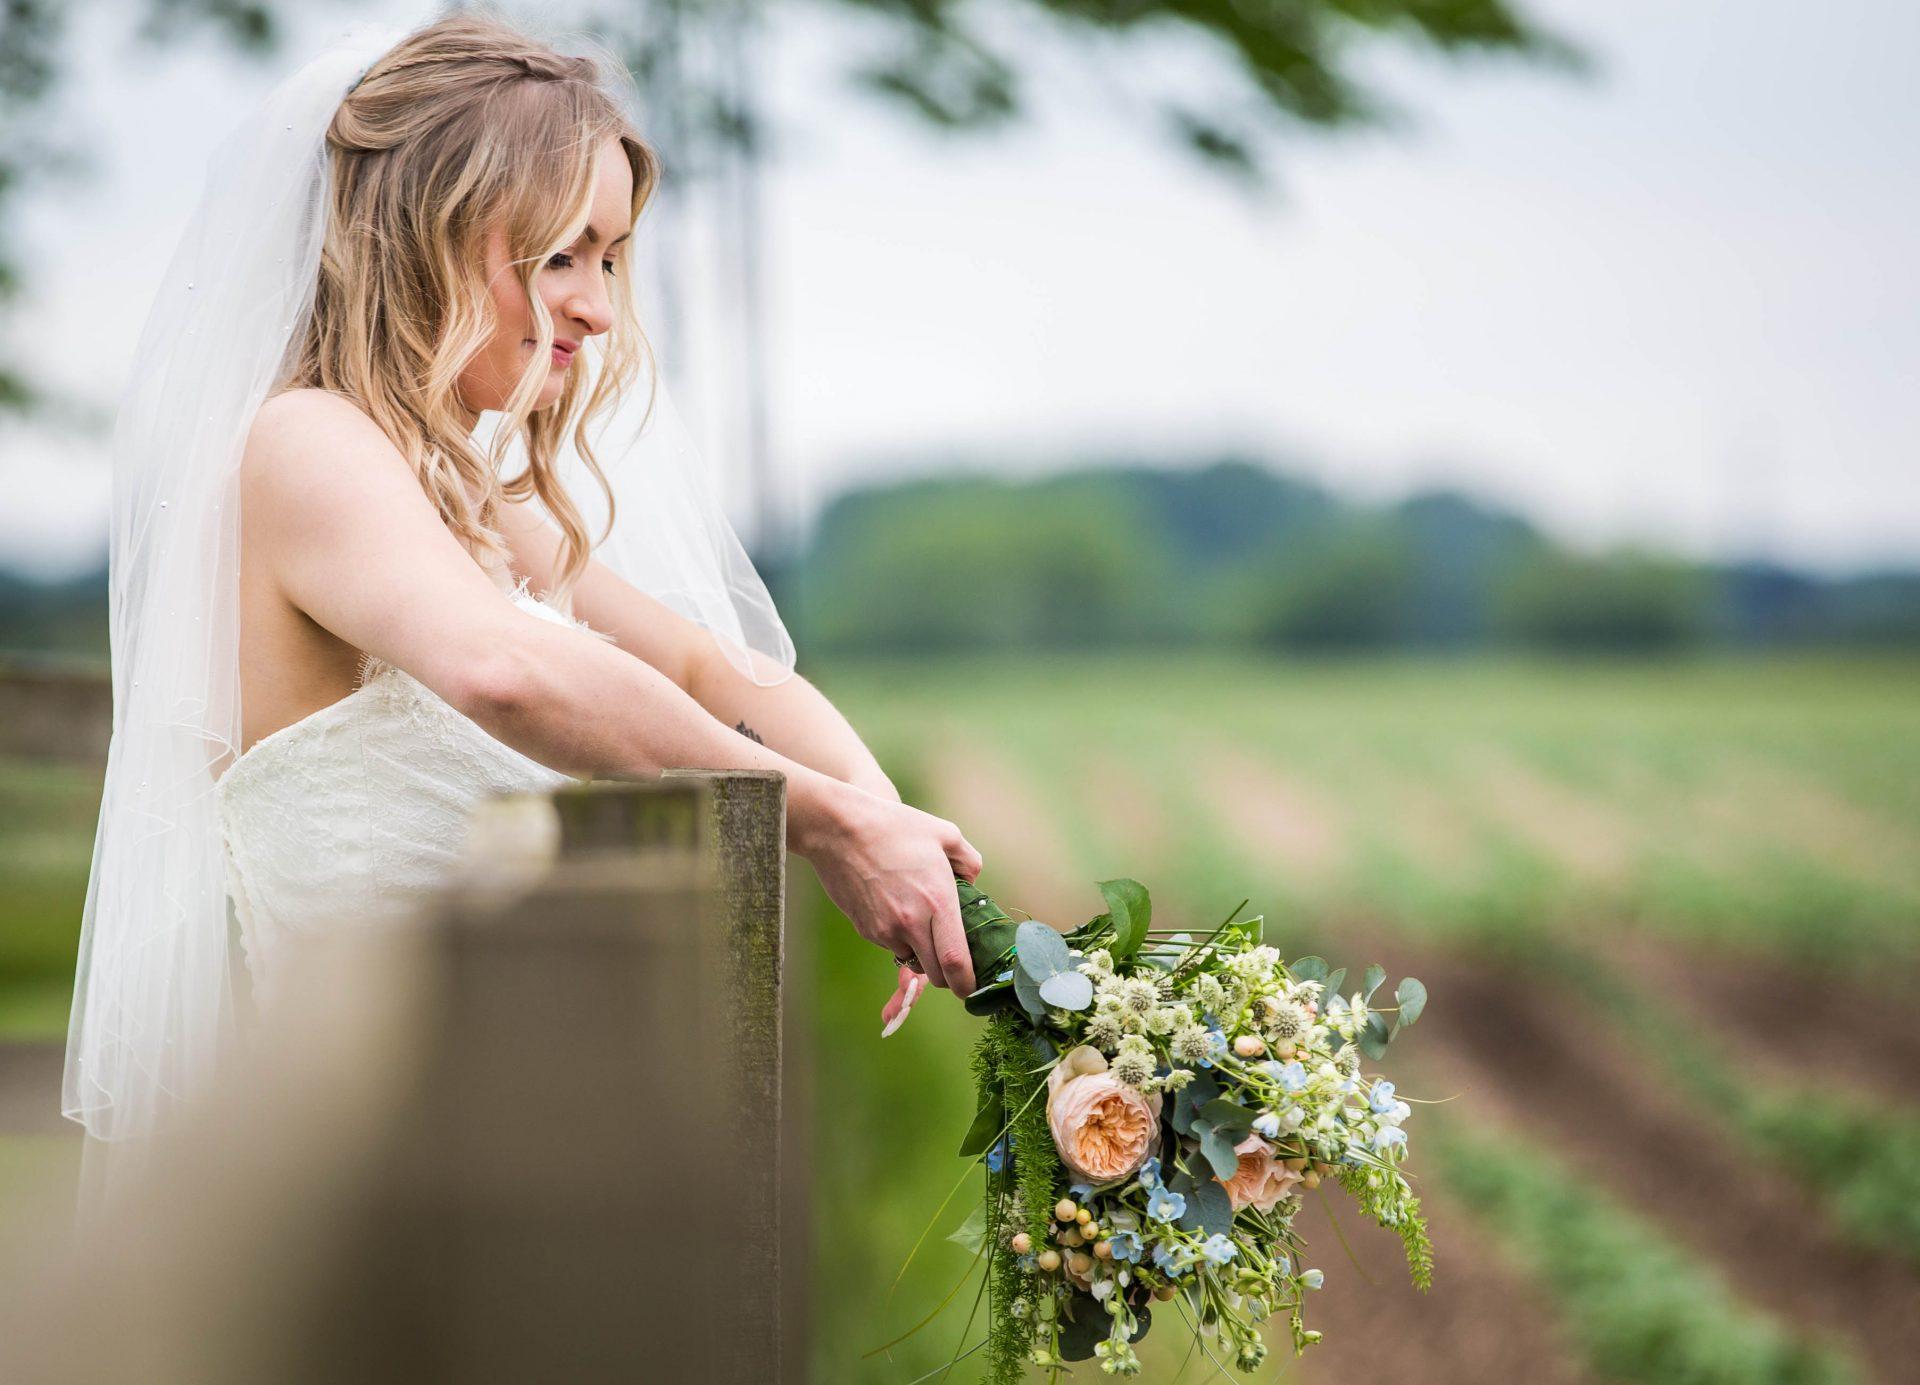 Professional wedding Photographer in Yorkshire